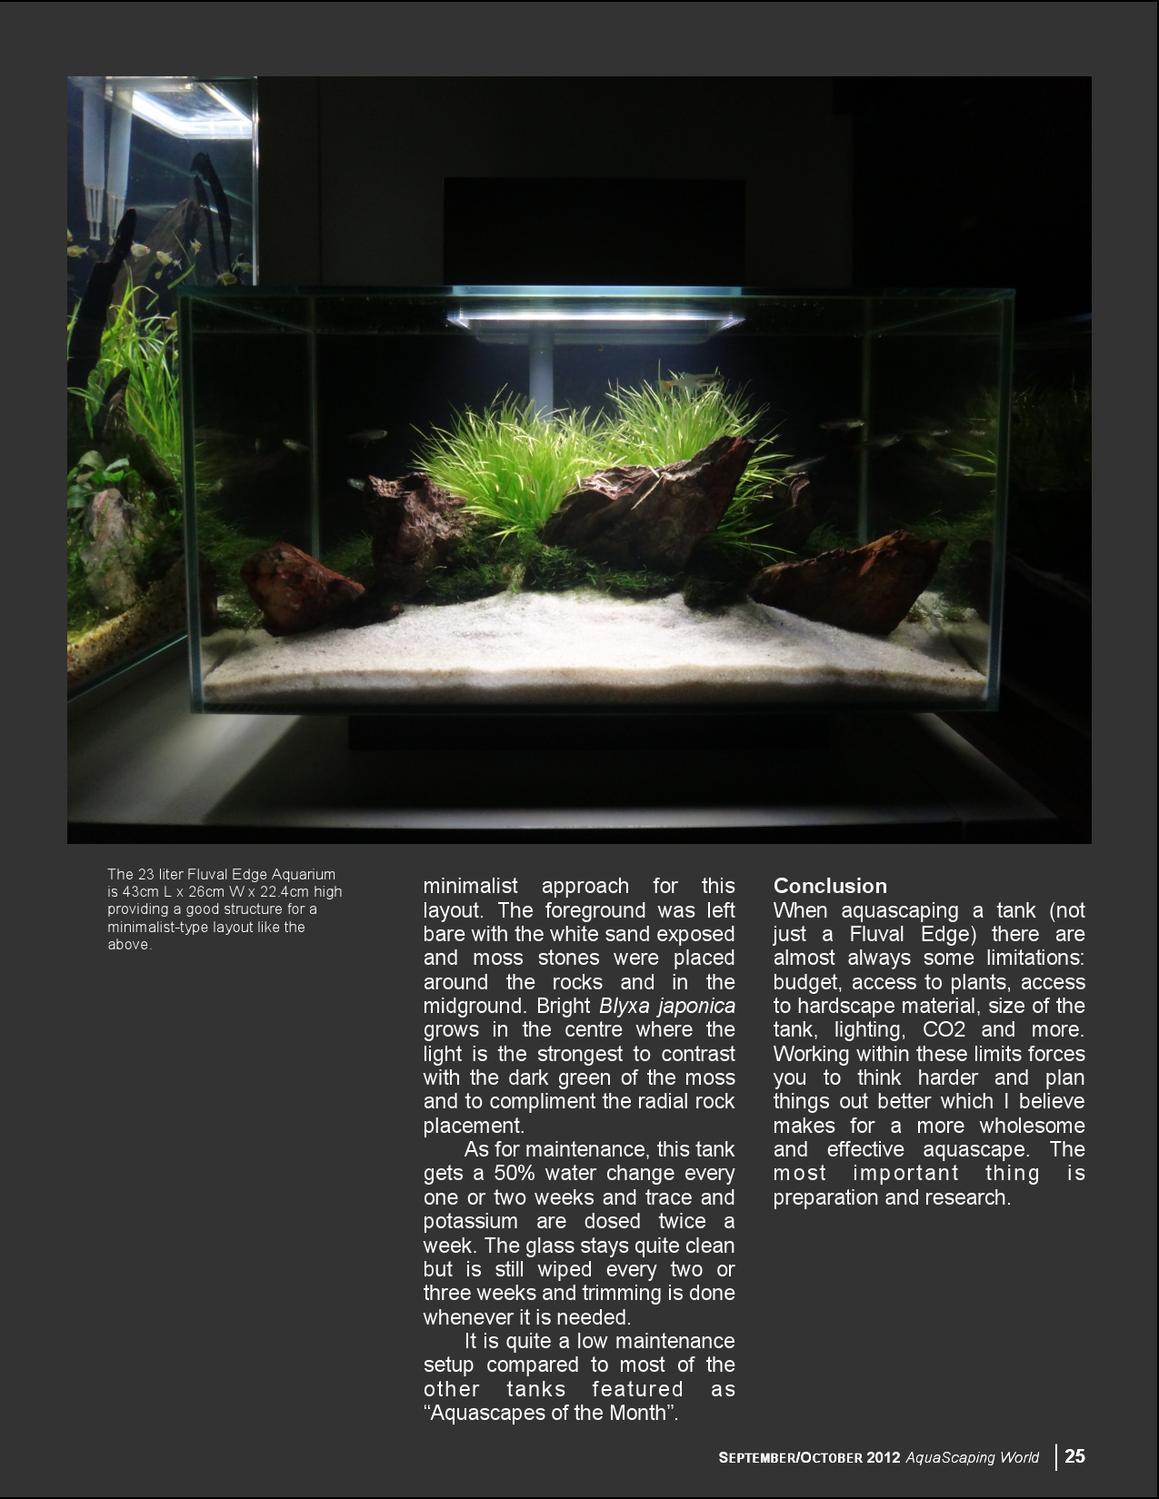 AquaScaping World Magazine September/October 2012 by John ...